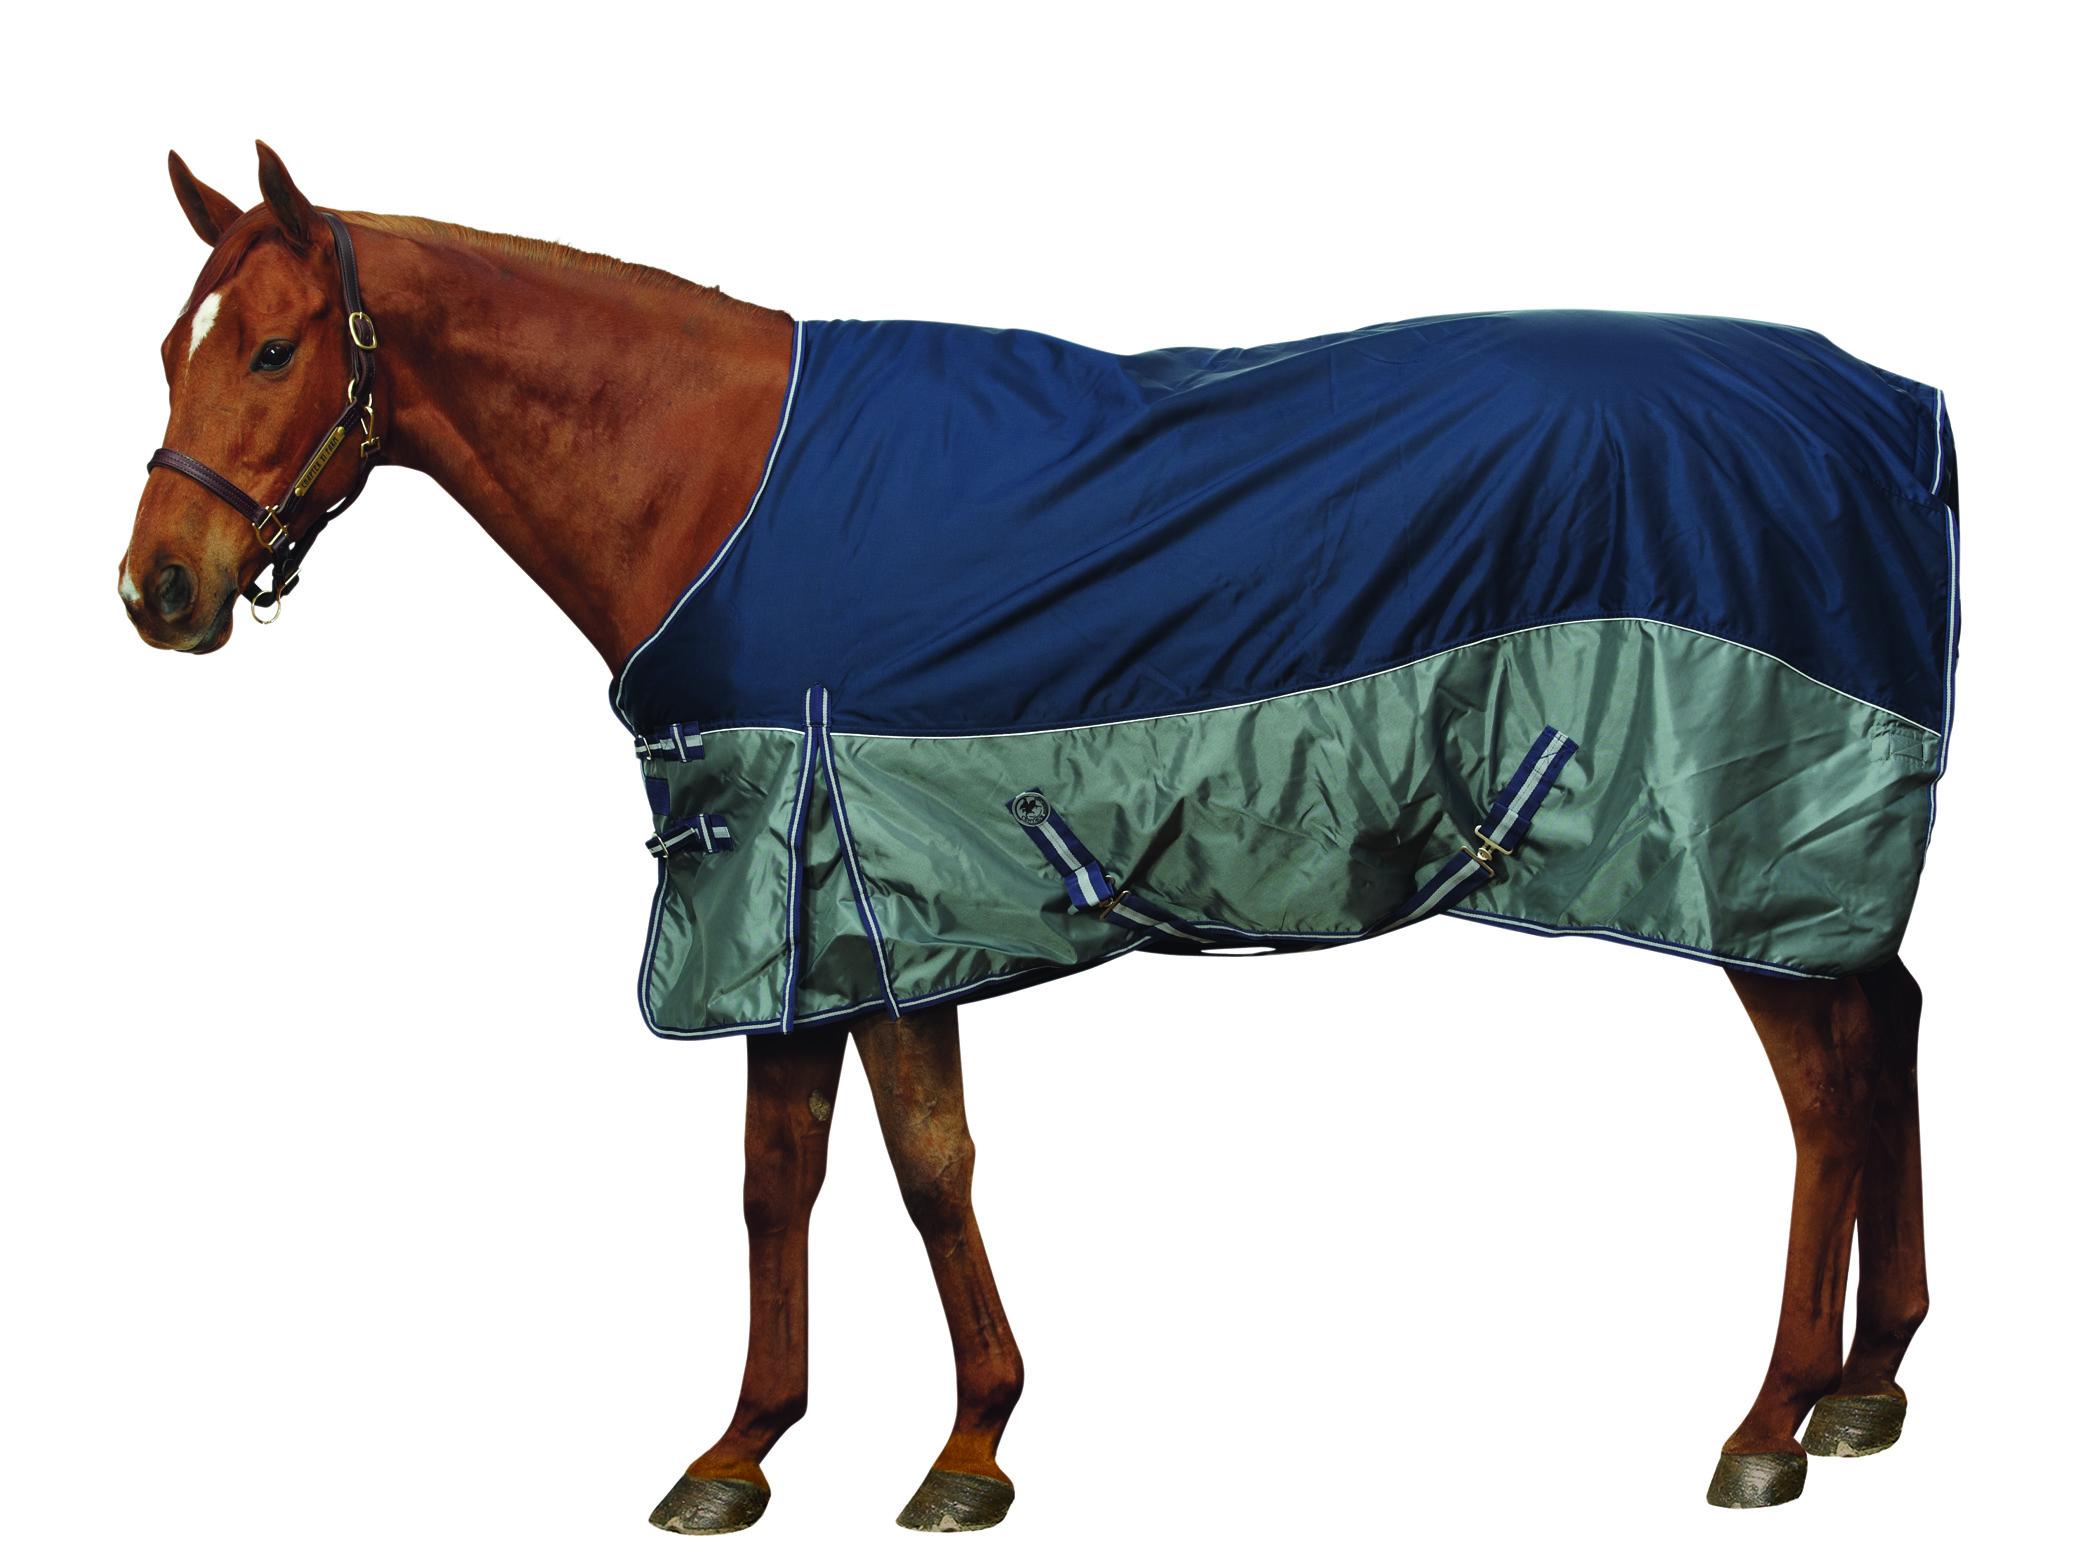 Centaur 840D wTherma Dry/Sheet